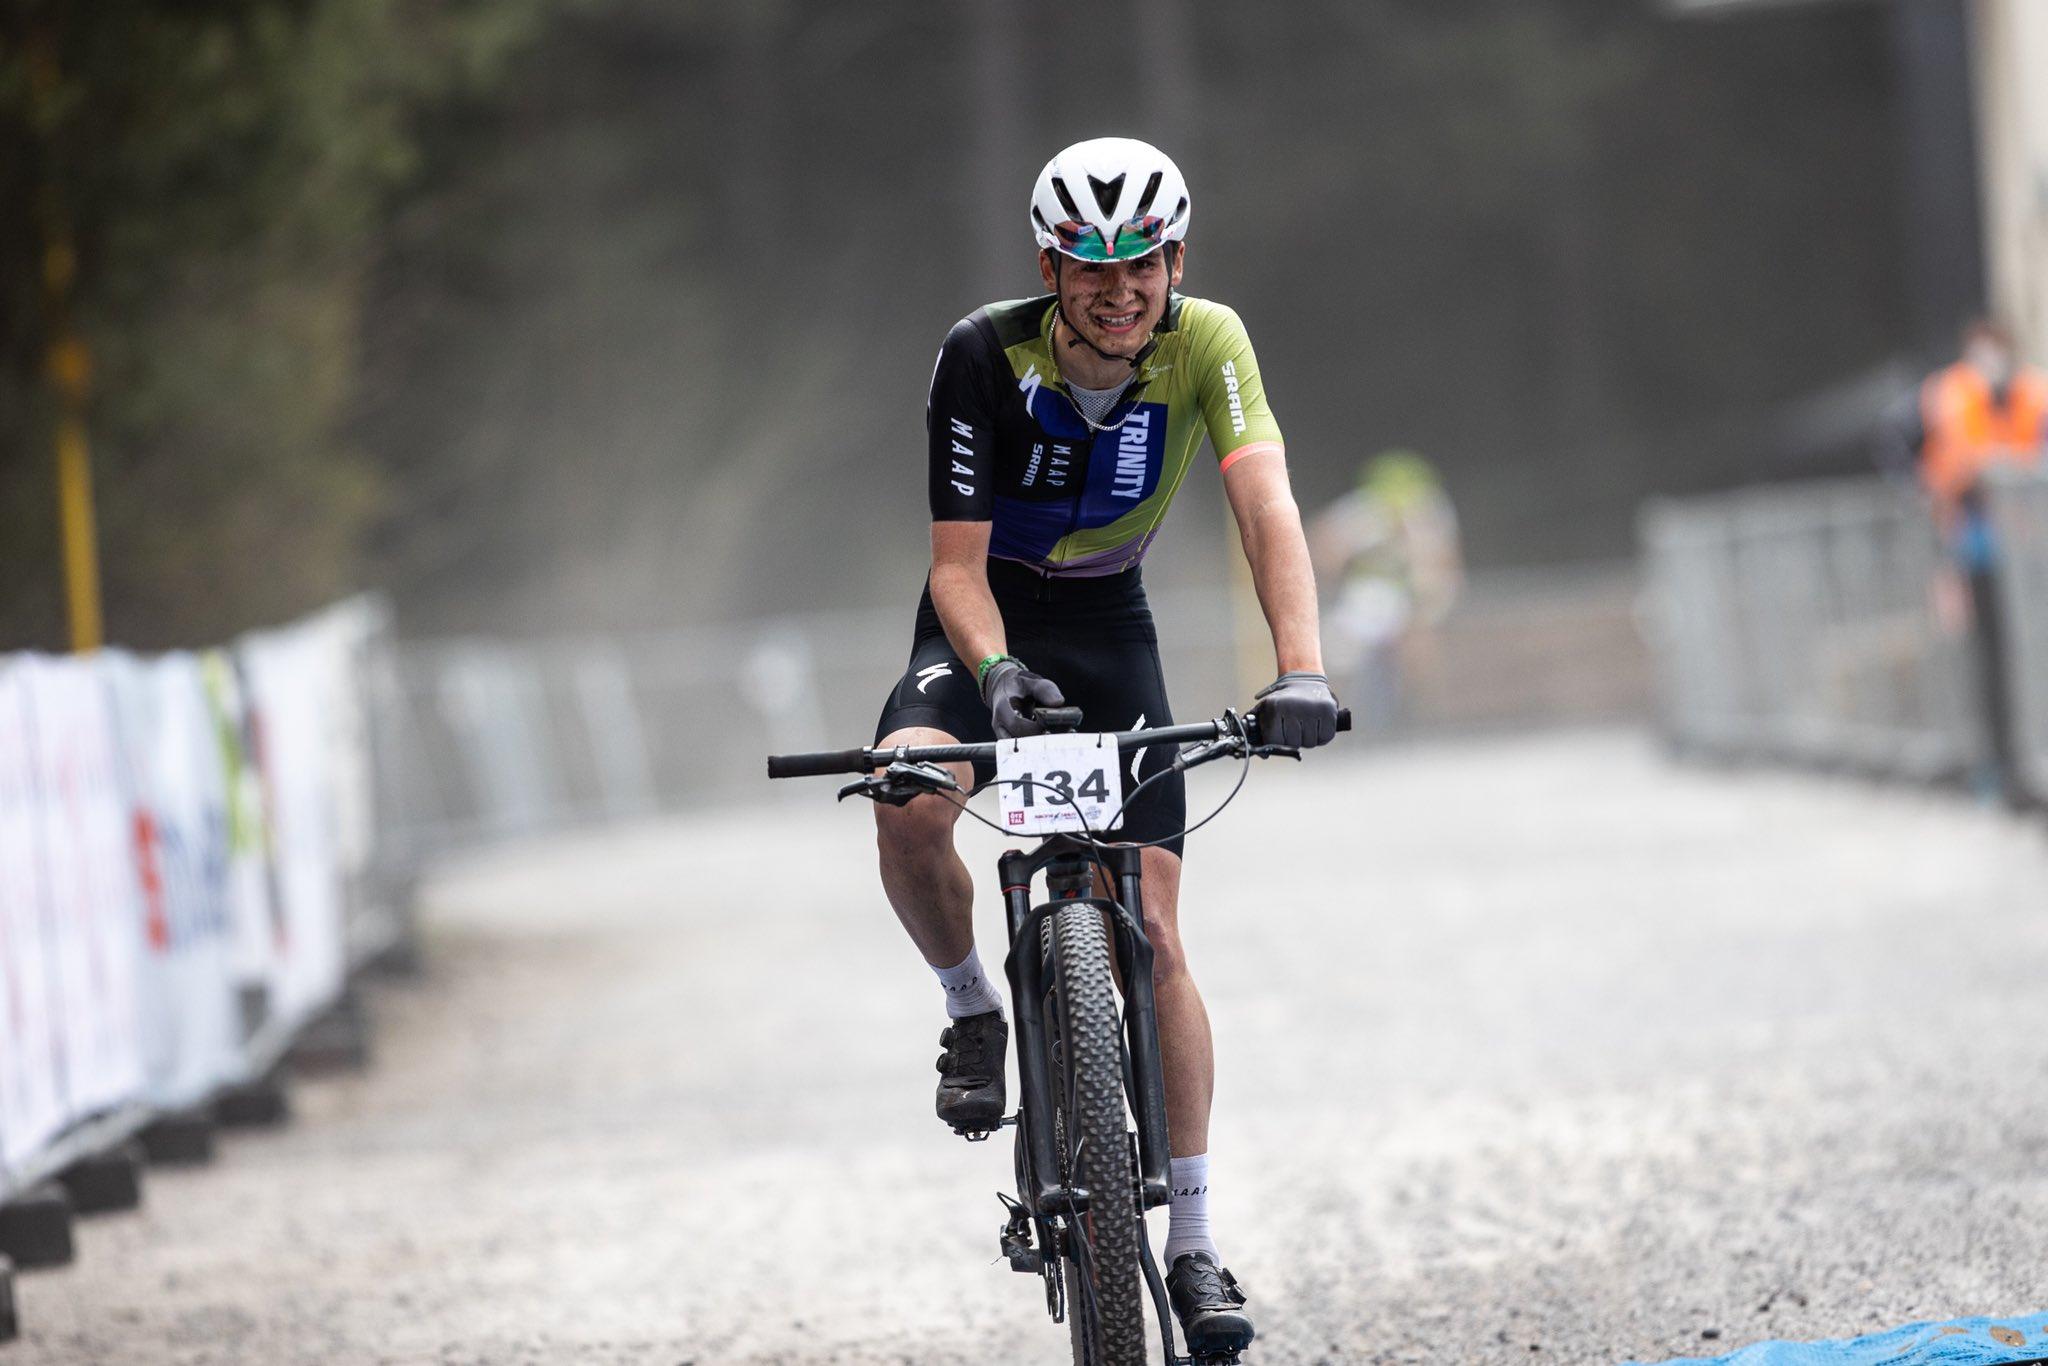 Cameron Mason racing at Oetzaler Haiming Trinity Racing Austria 2021